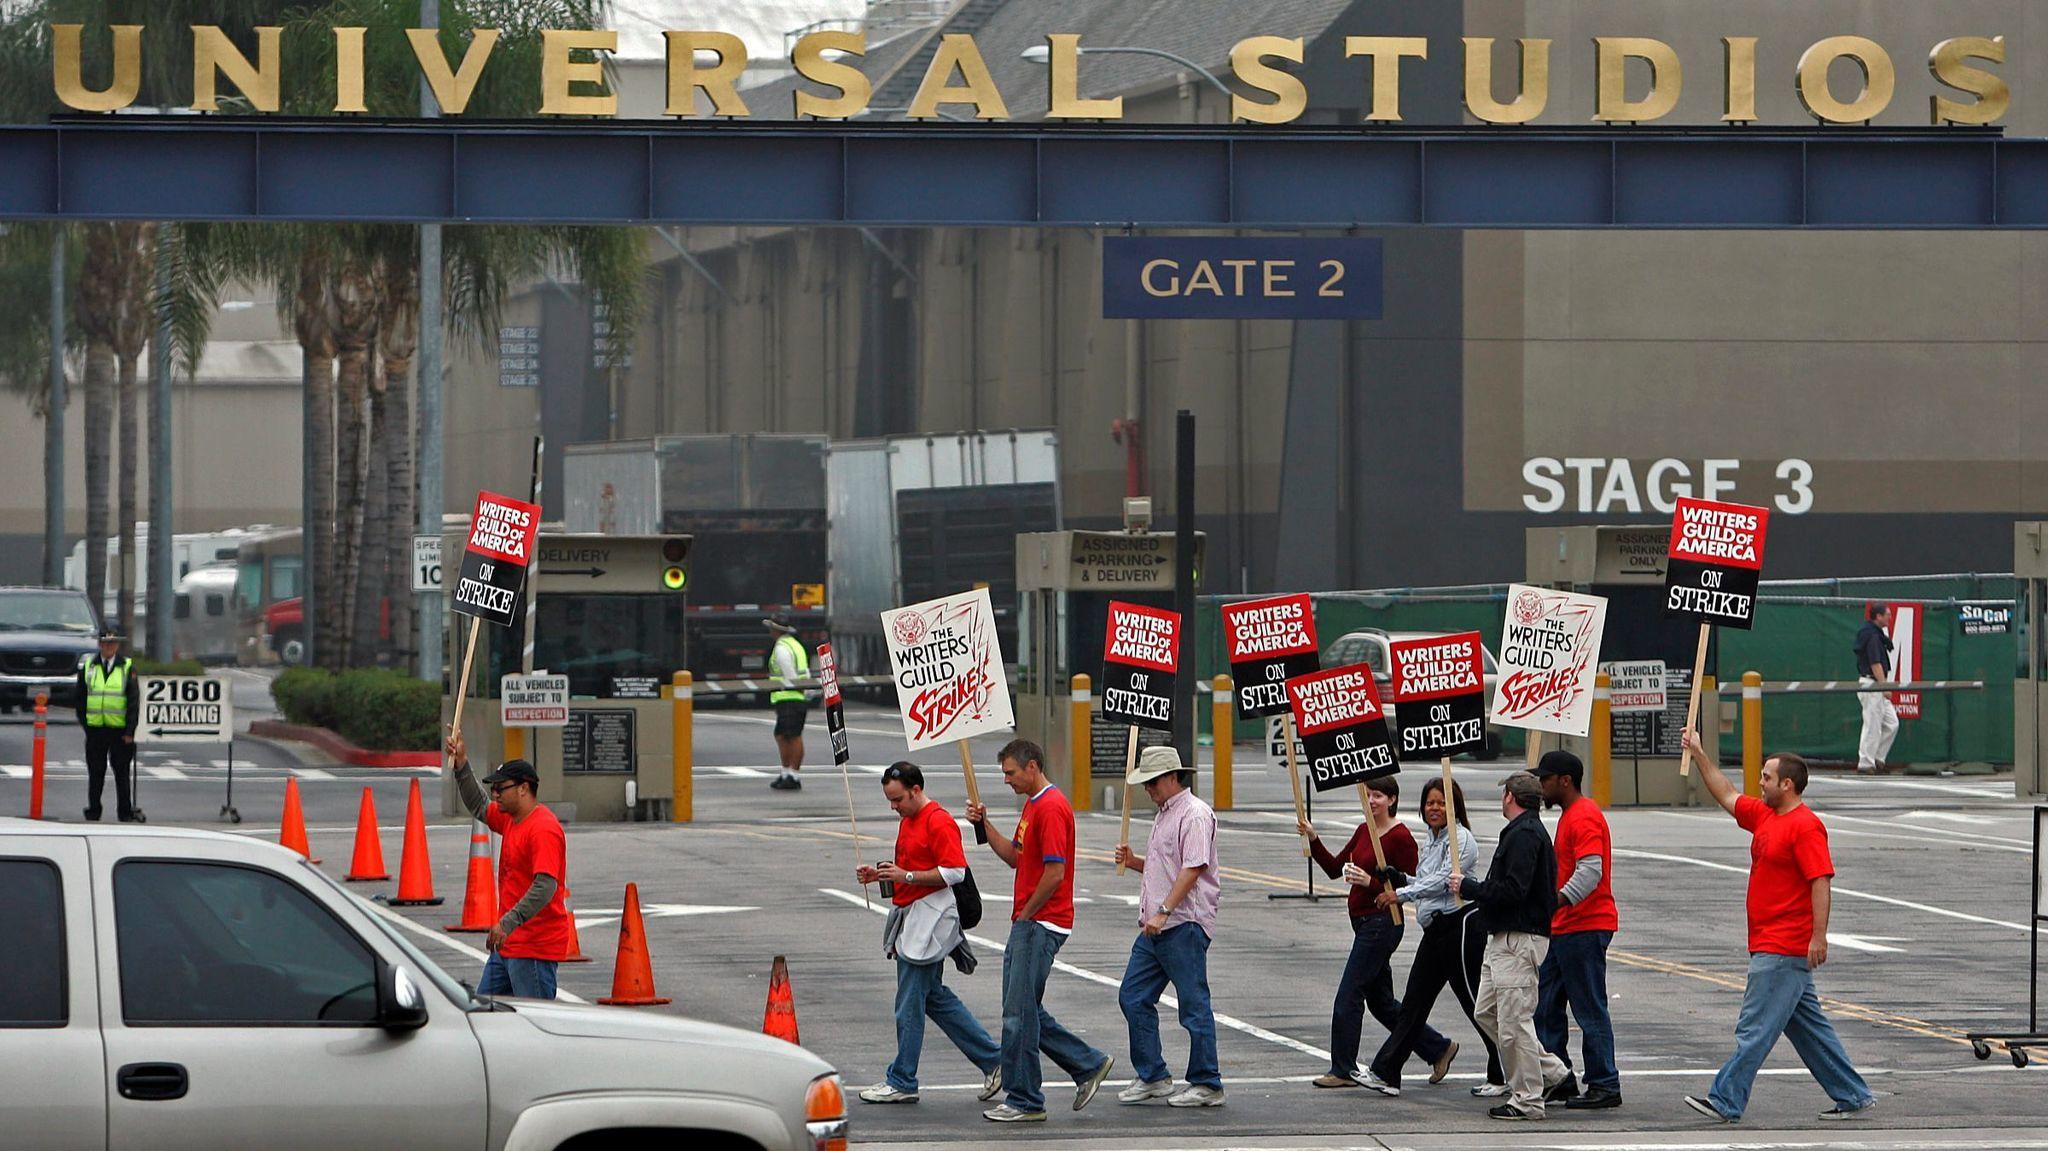 Writers Guild of America strikers in 2007 picket outside Universal Studios.